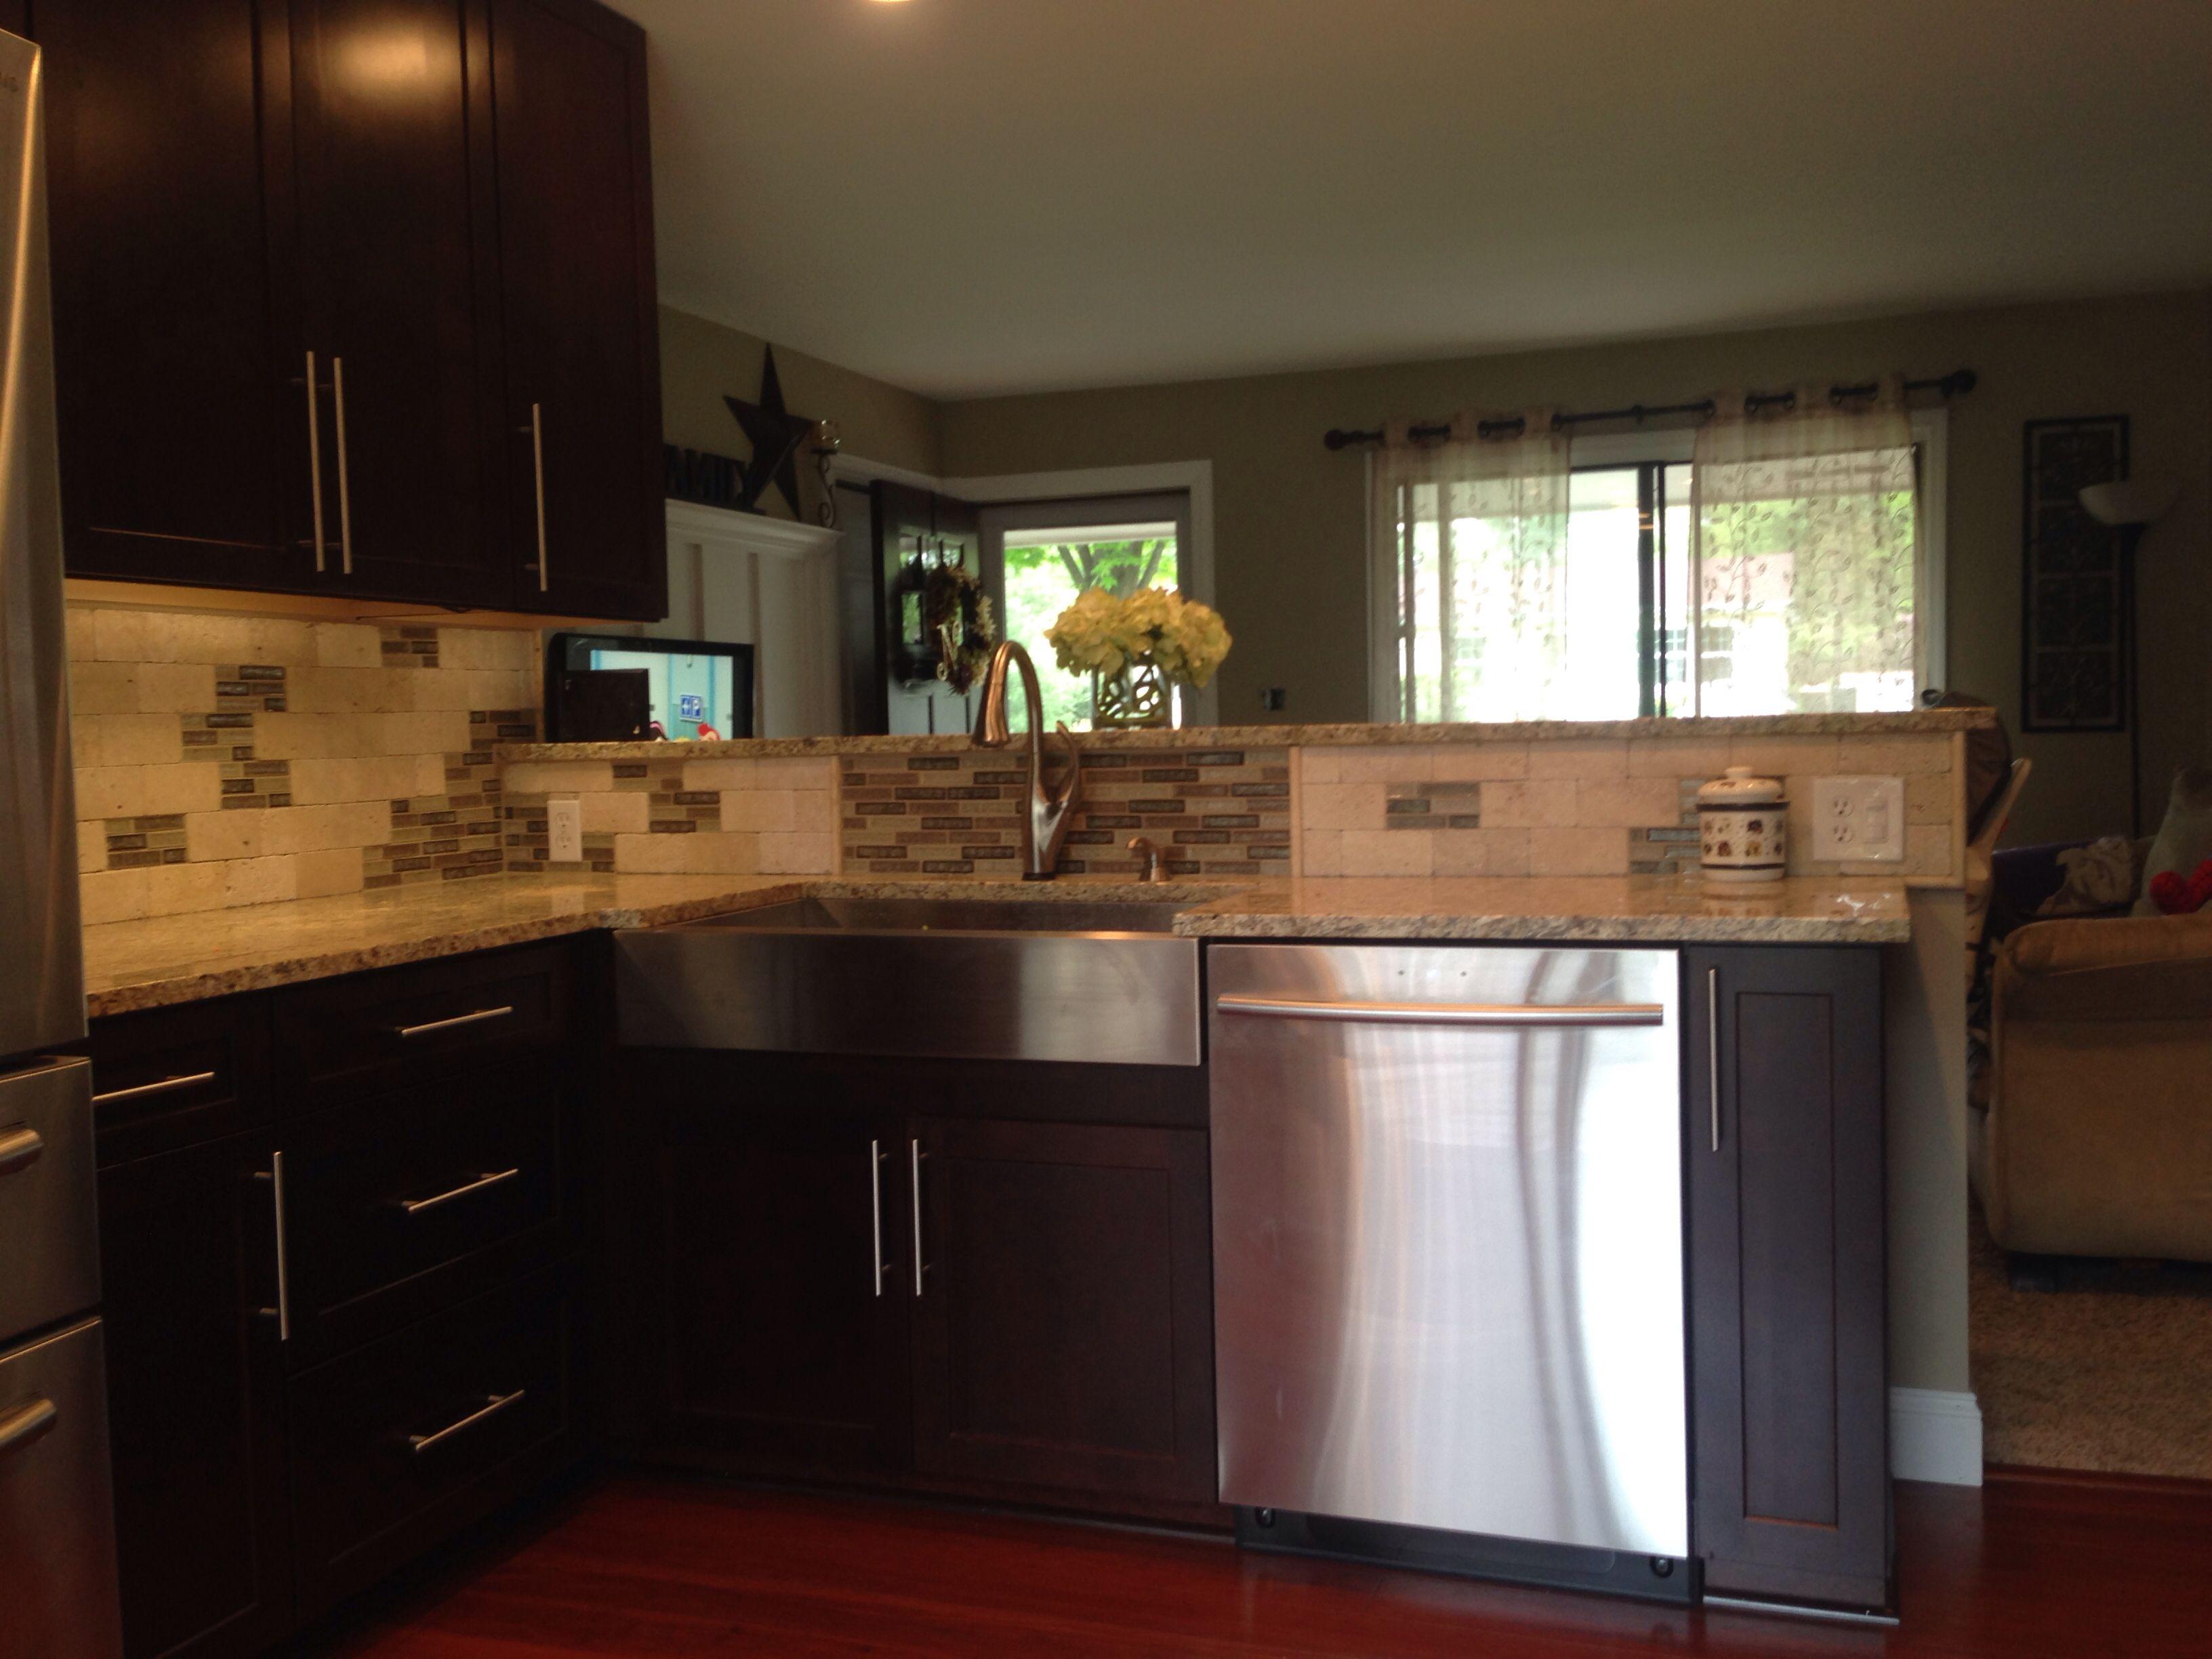 Shenandoah Cabinets Style Breckinridge In Cherry Java Kitchen Interior Cabinet Styles Shenandoah Cabinets